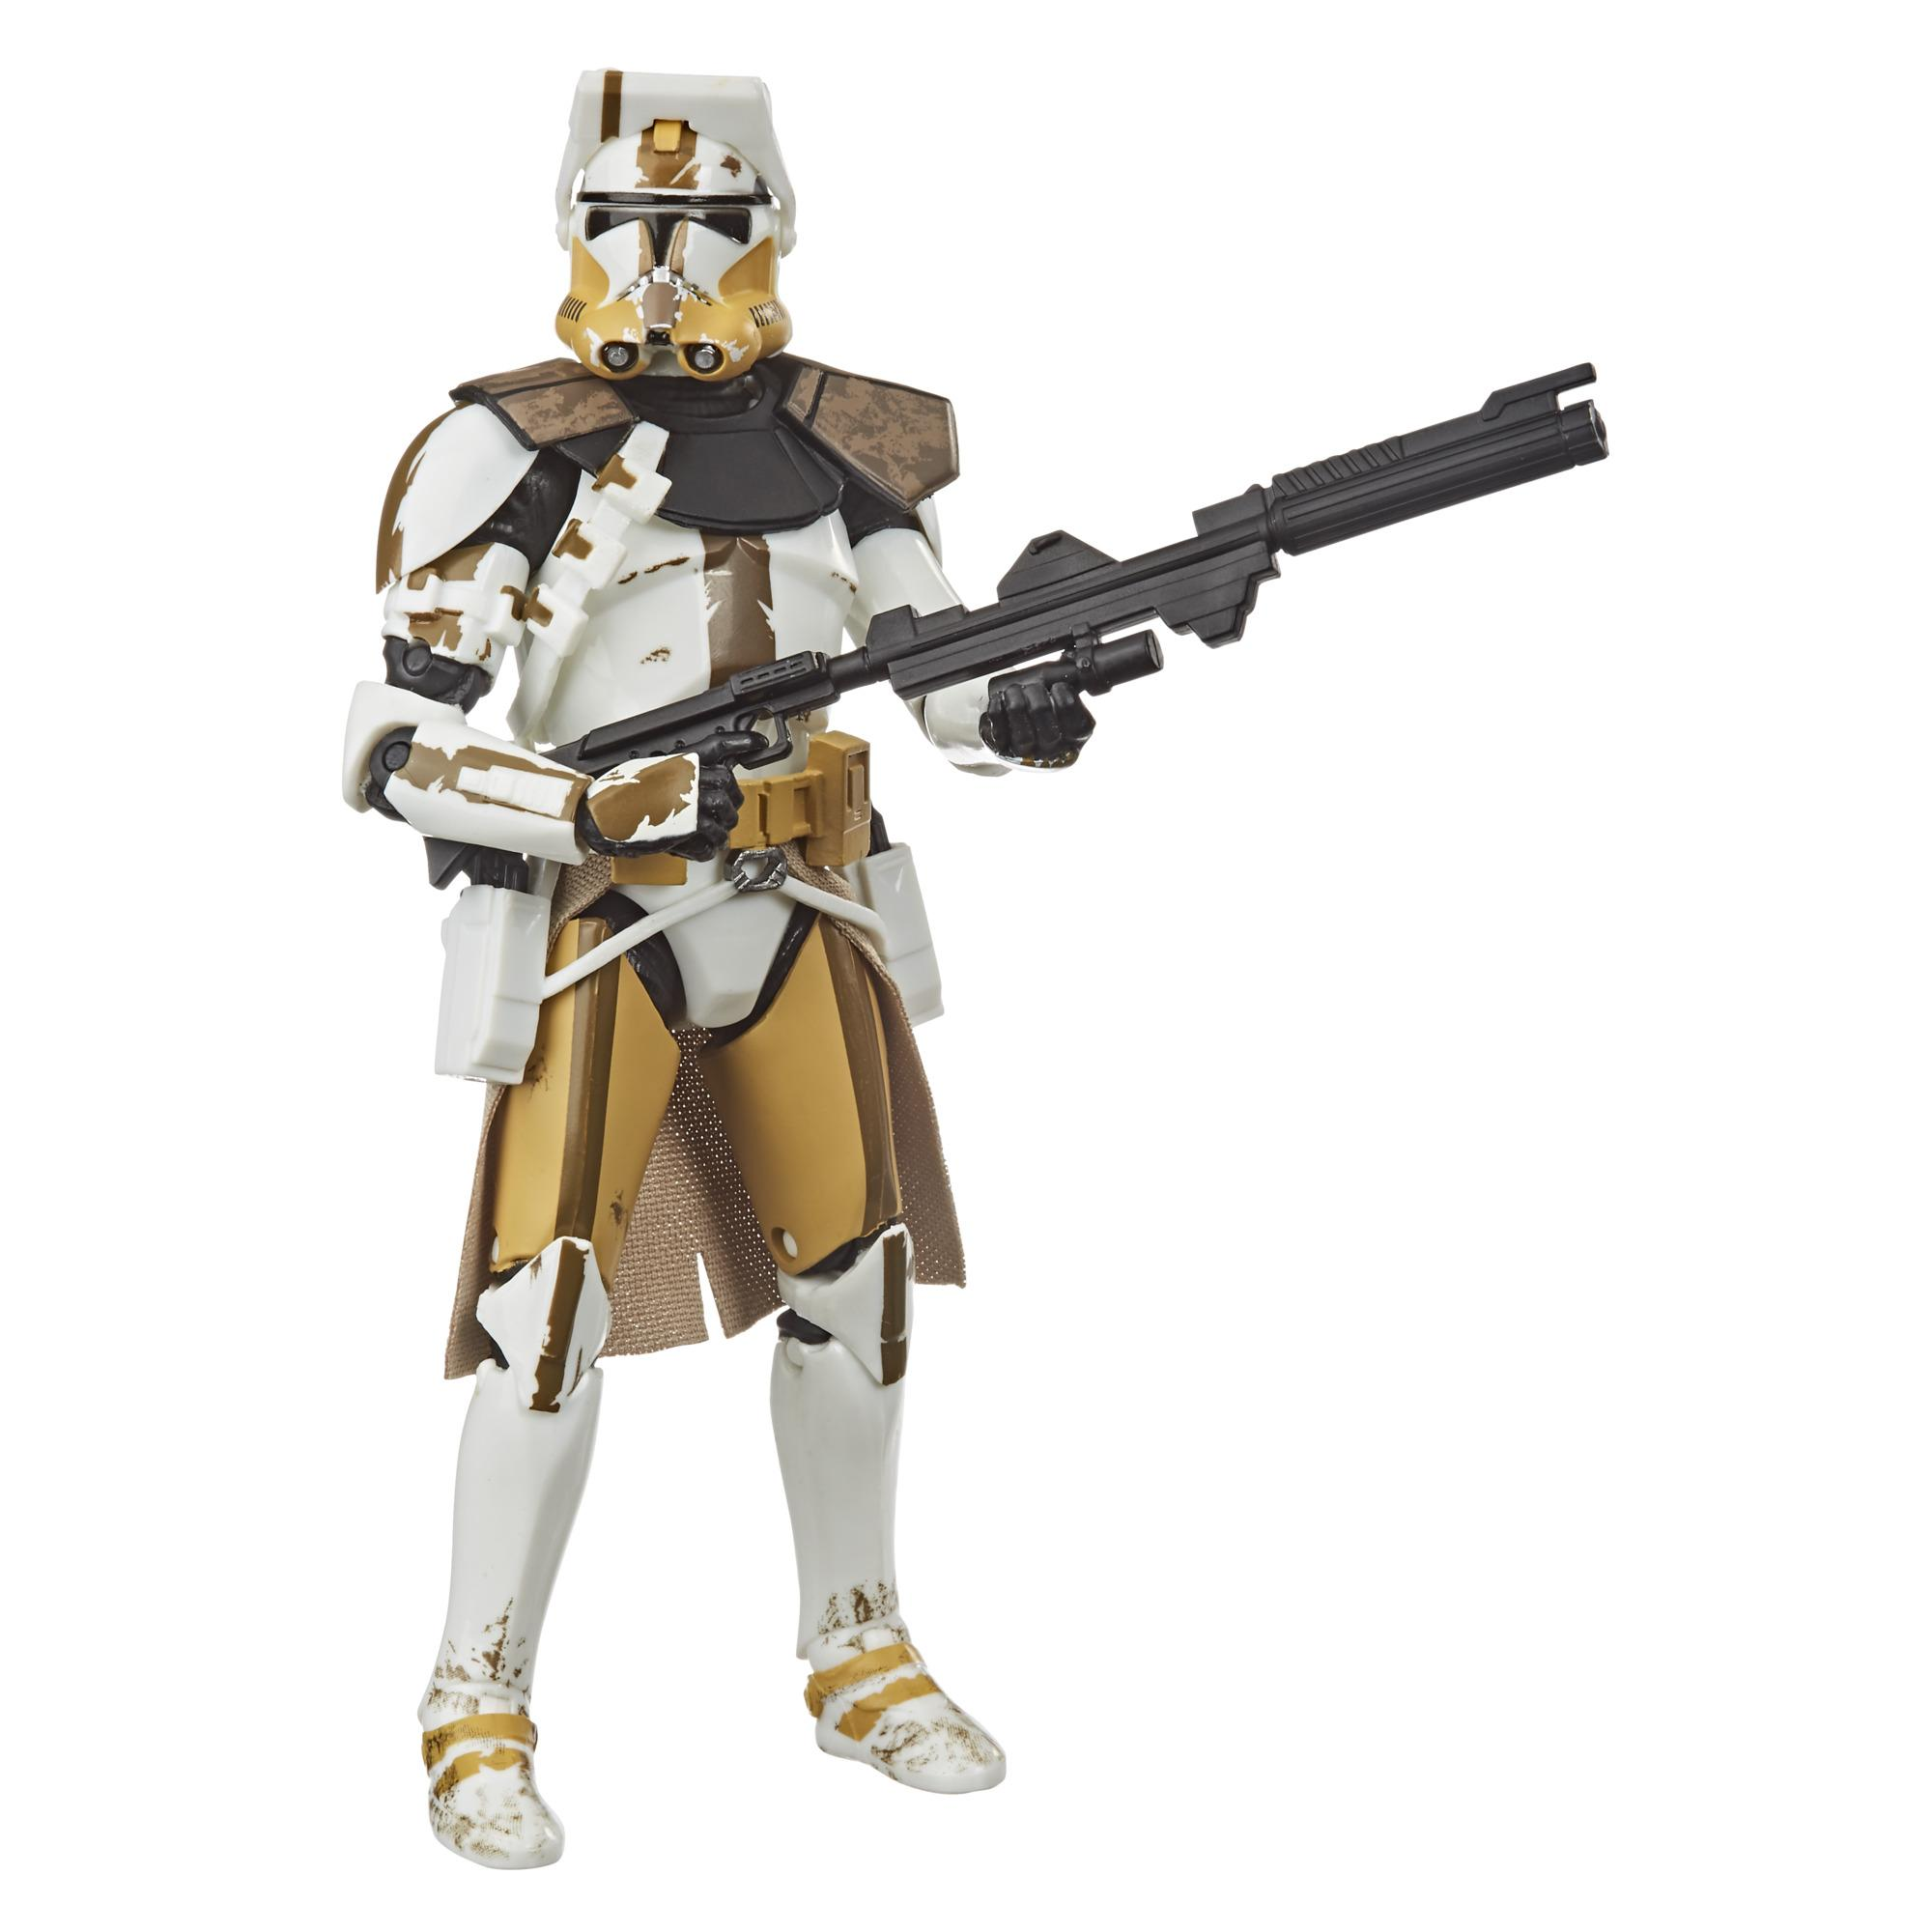 Star Wars The Black Series - Clone Commander Bly - Figura de 15 cm de Star Wars: Guerra de los Clones